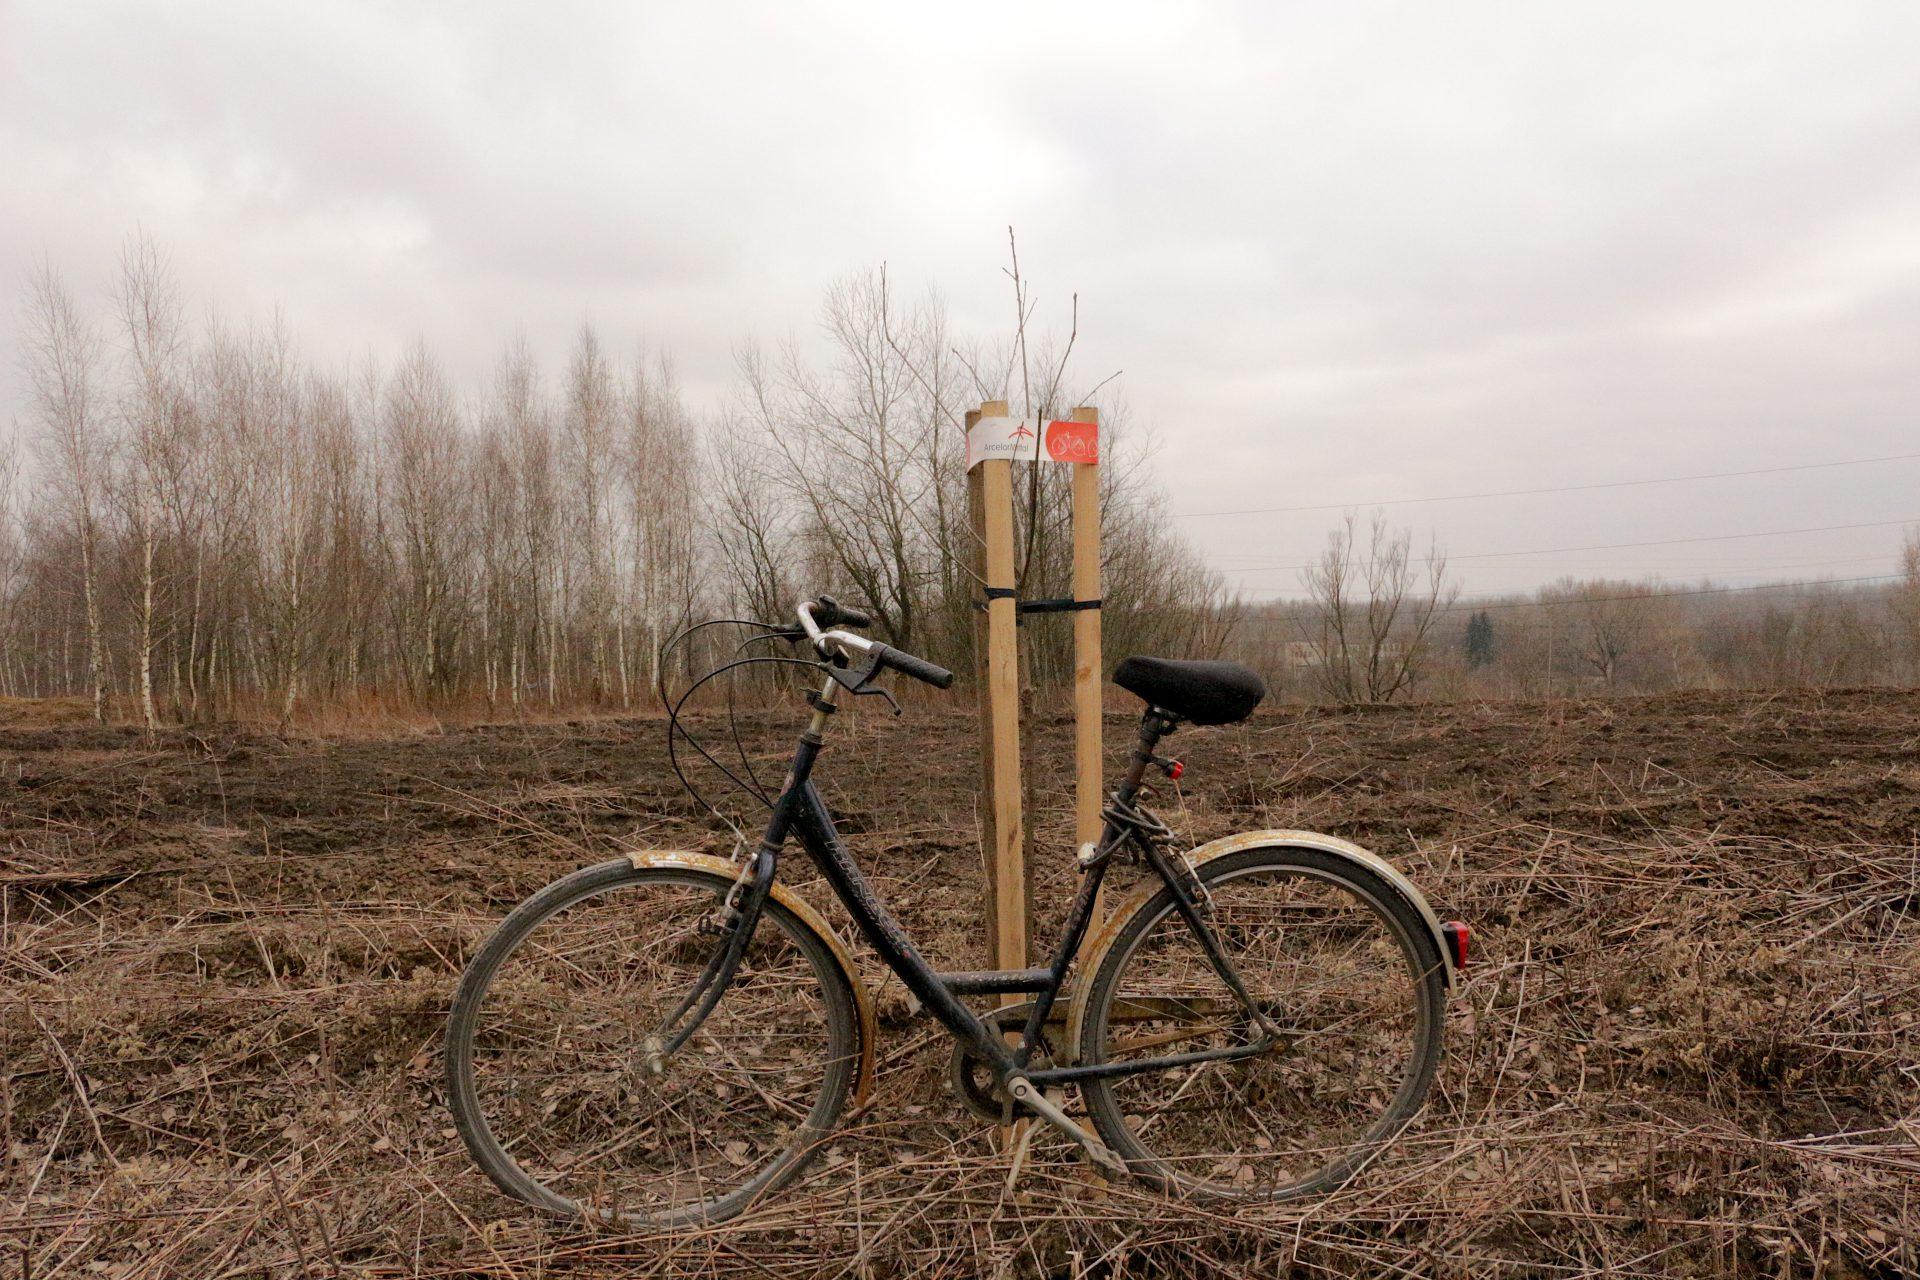 Nowa Huta zieleń drzewa